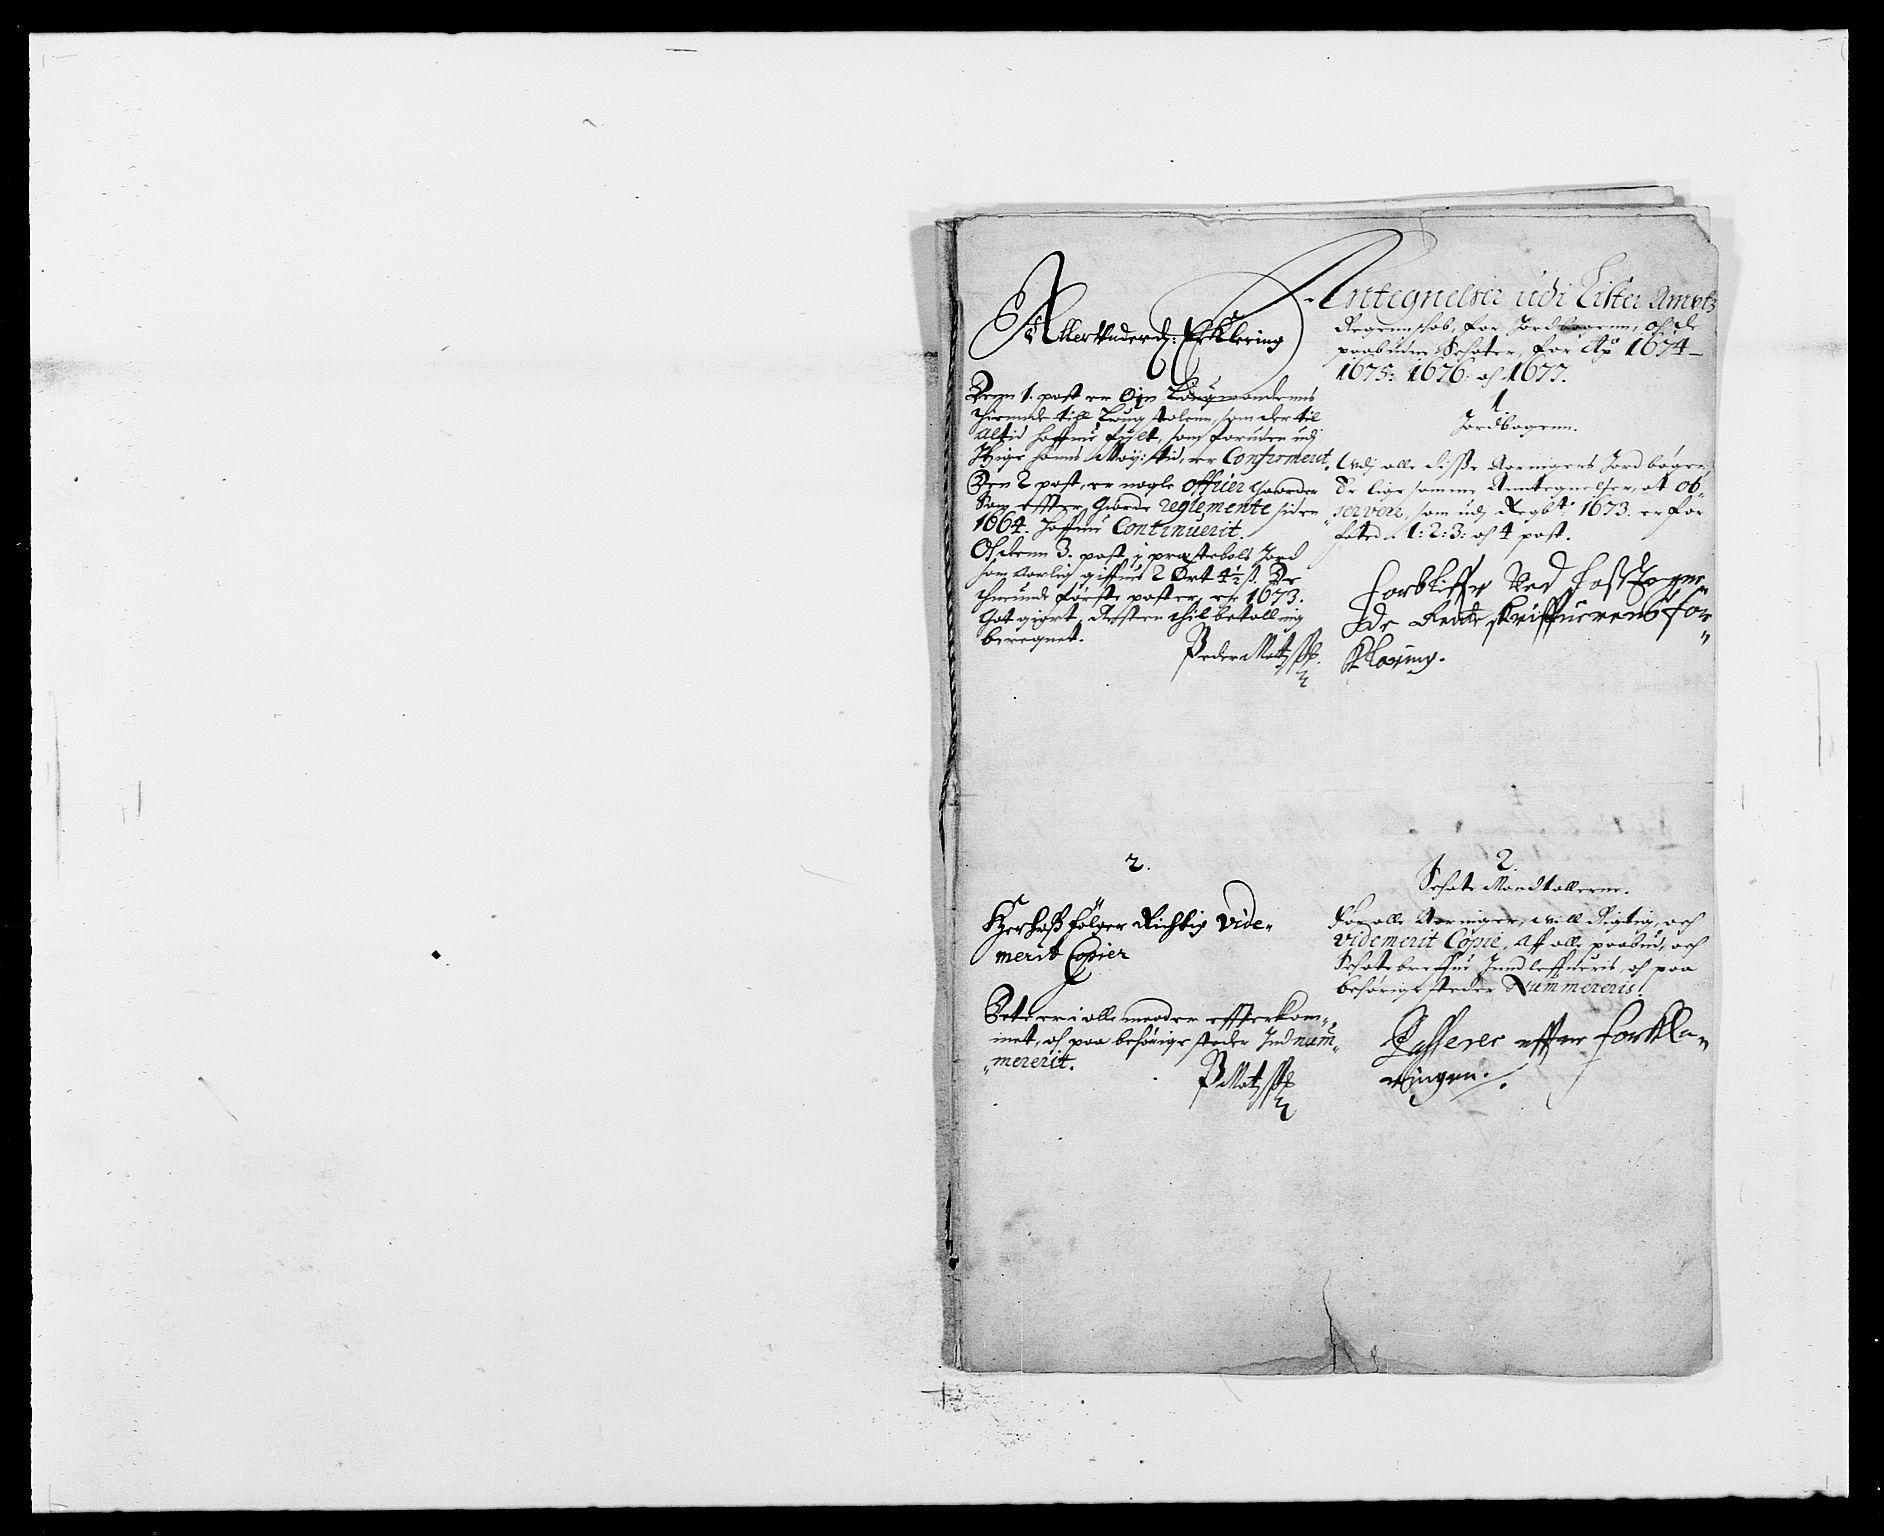 RA, Rentekammeret inntil 1814, Reviderte regnskaper, Fogderegnskap, R41/L2530: Fogderegnskap Lista, 1677-1679, s. 159